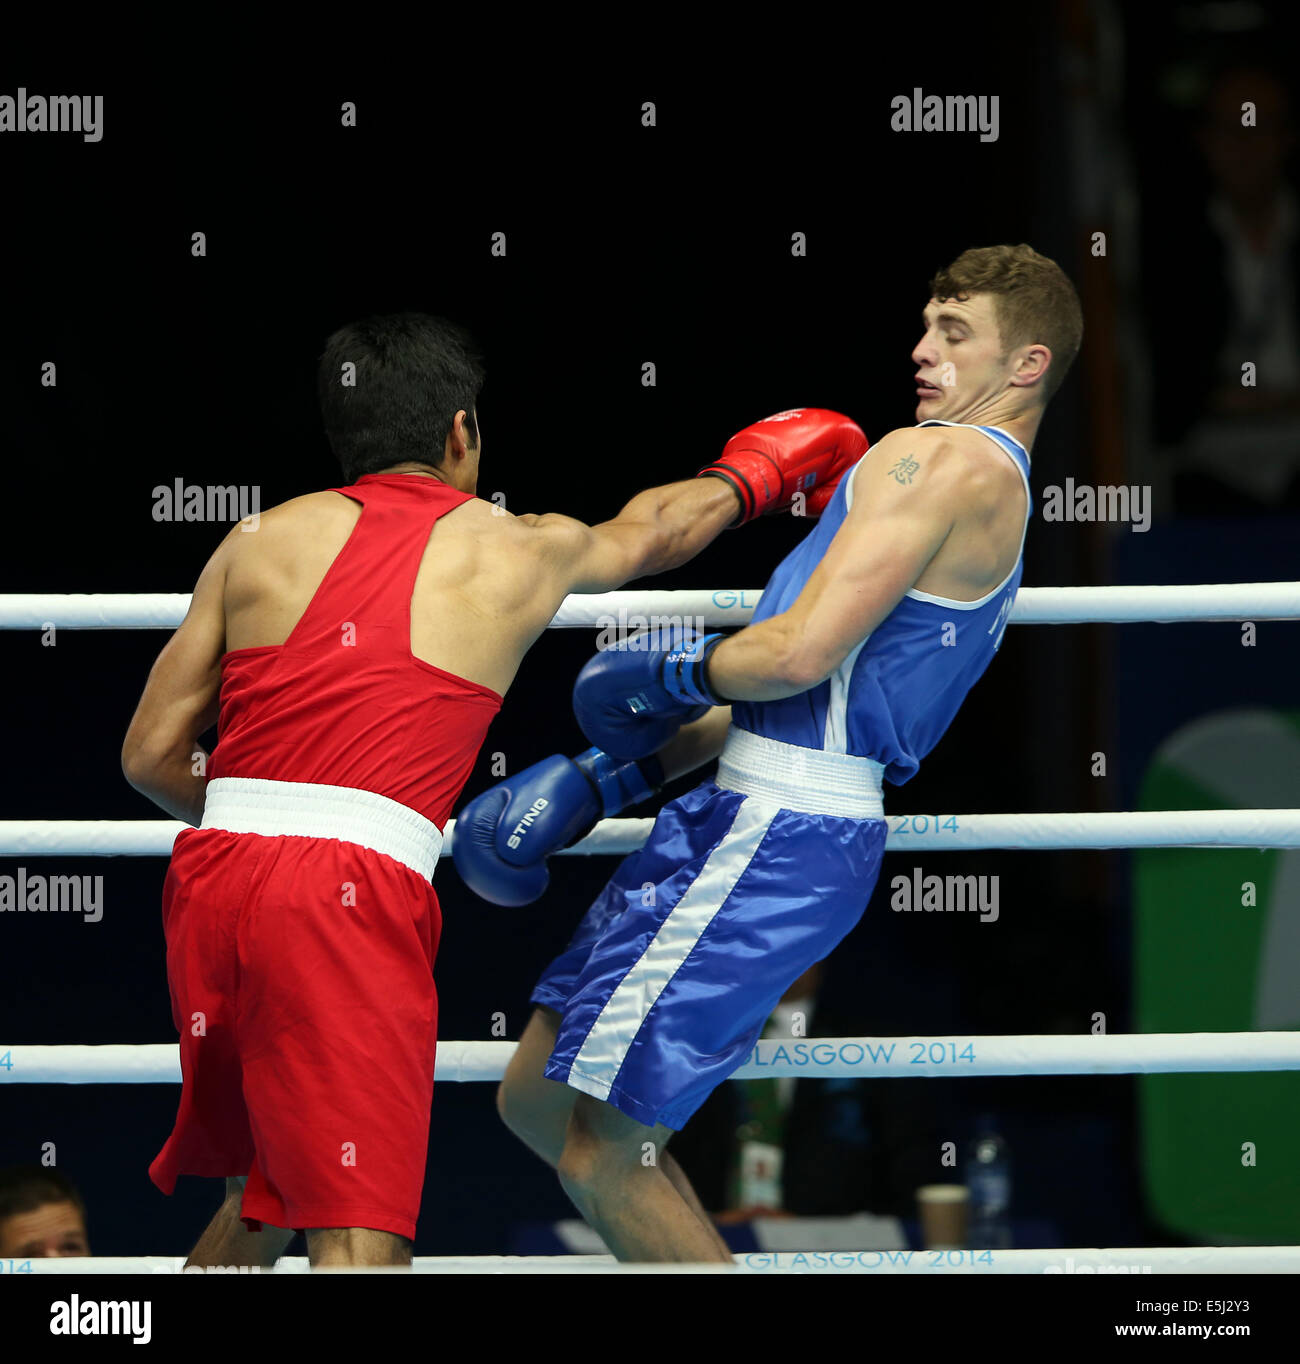 Scotstoun, Glasgow Scotland 1 Aug 2014. Day 9 Boxing semi-finals.  Vijender Vijender IND beats Connor Coyle NIR - Stock Image